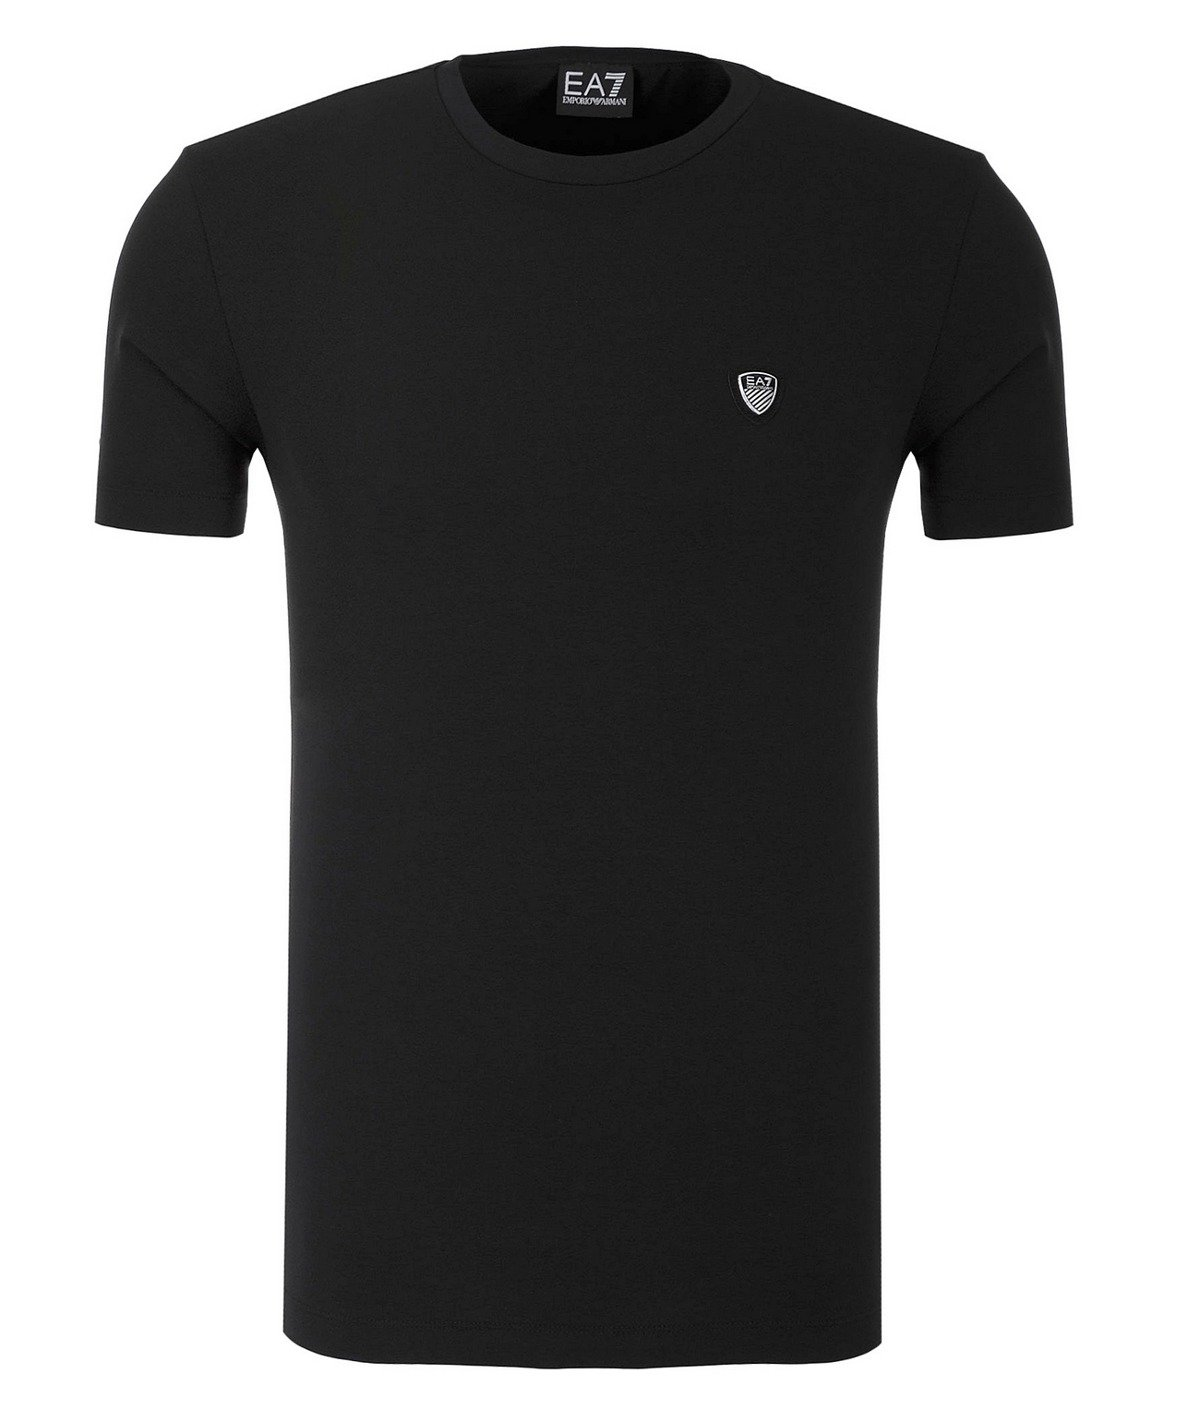 5a87ecd267 EMPORIO ARMANI EA7 3YPTL7 Herren Men T-Shirt Kurzarm Logo Figurbetont Click  to zoom ...